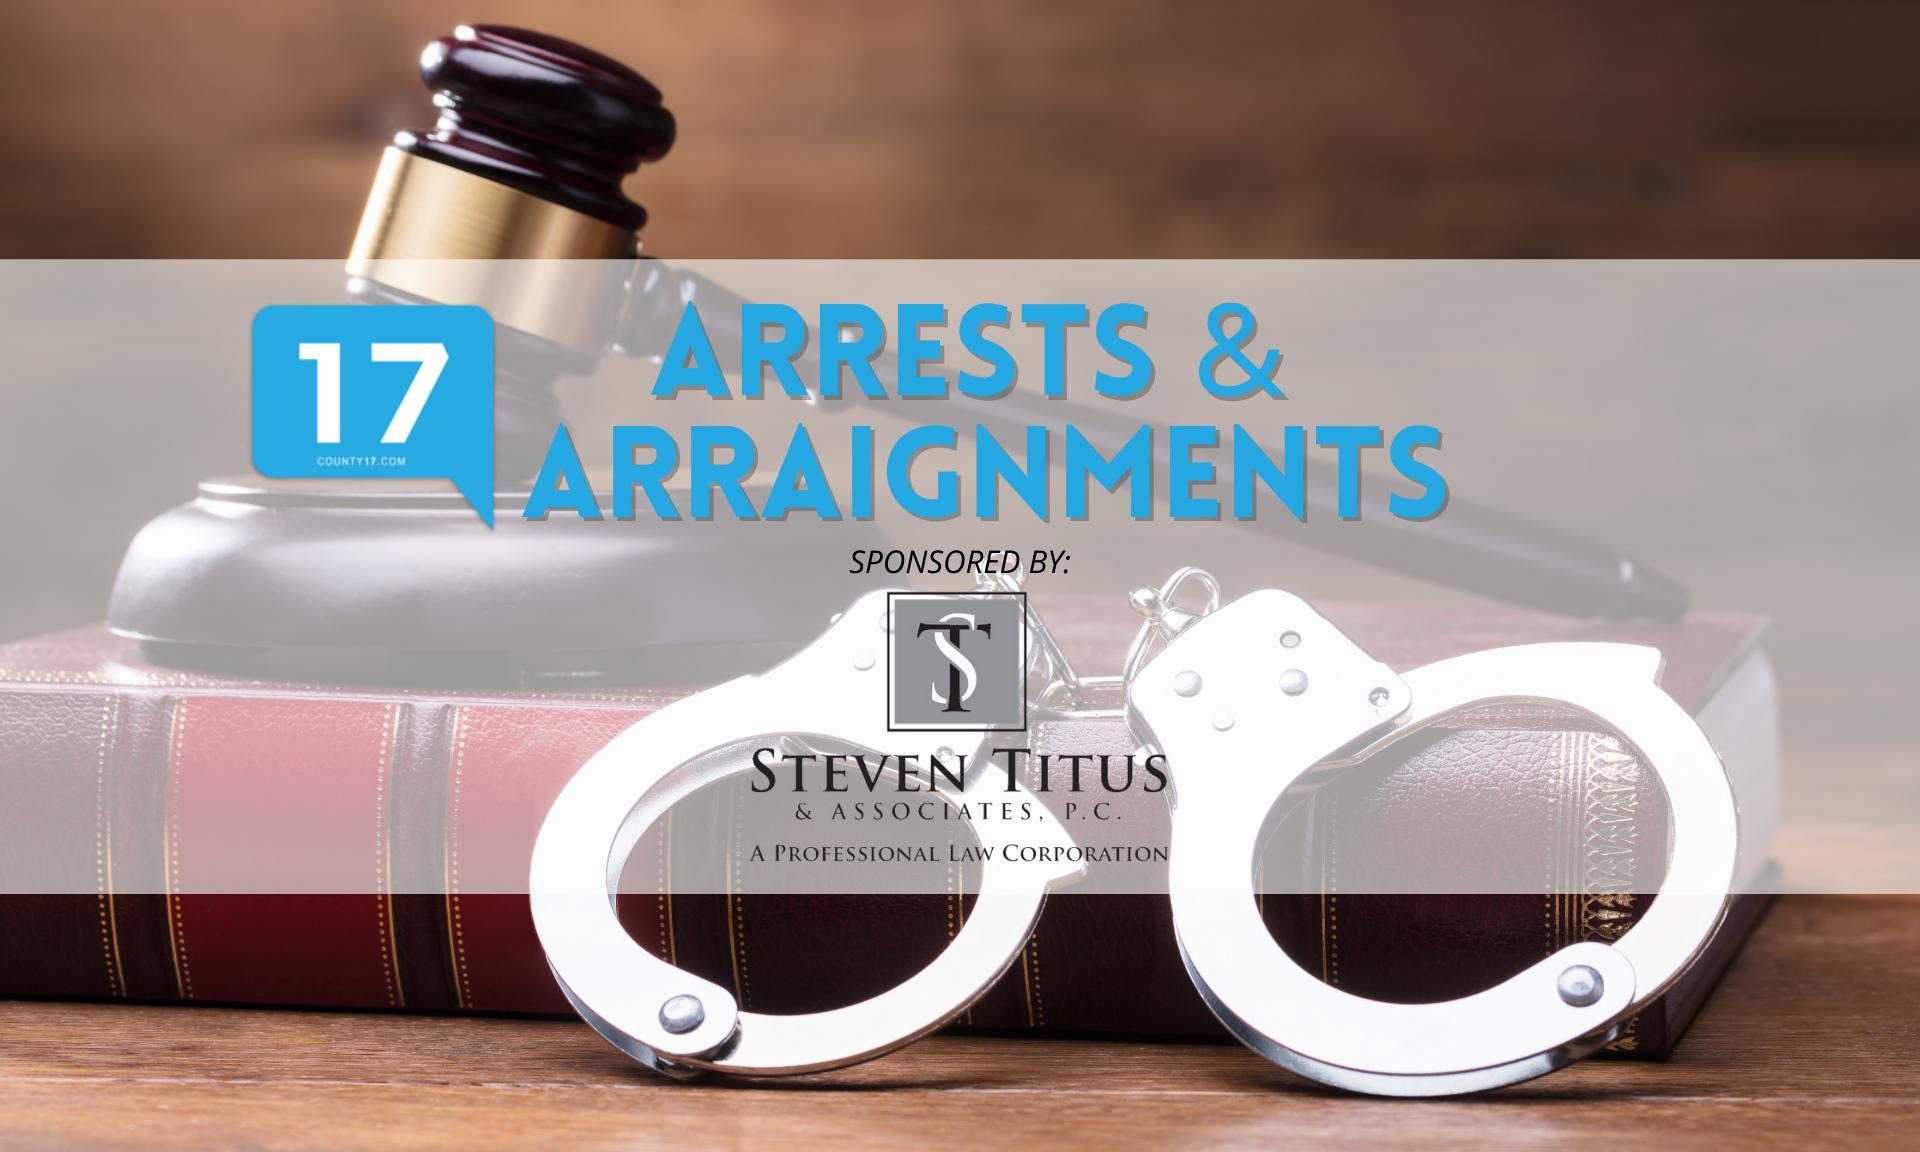 ArrestsArraignmentsV1.